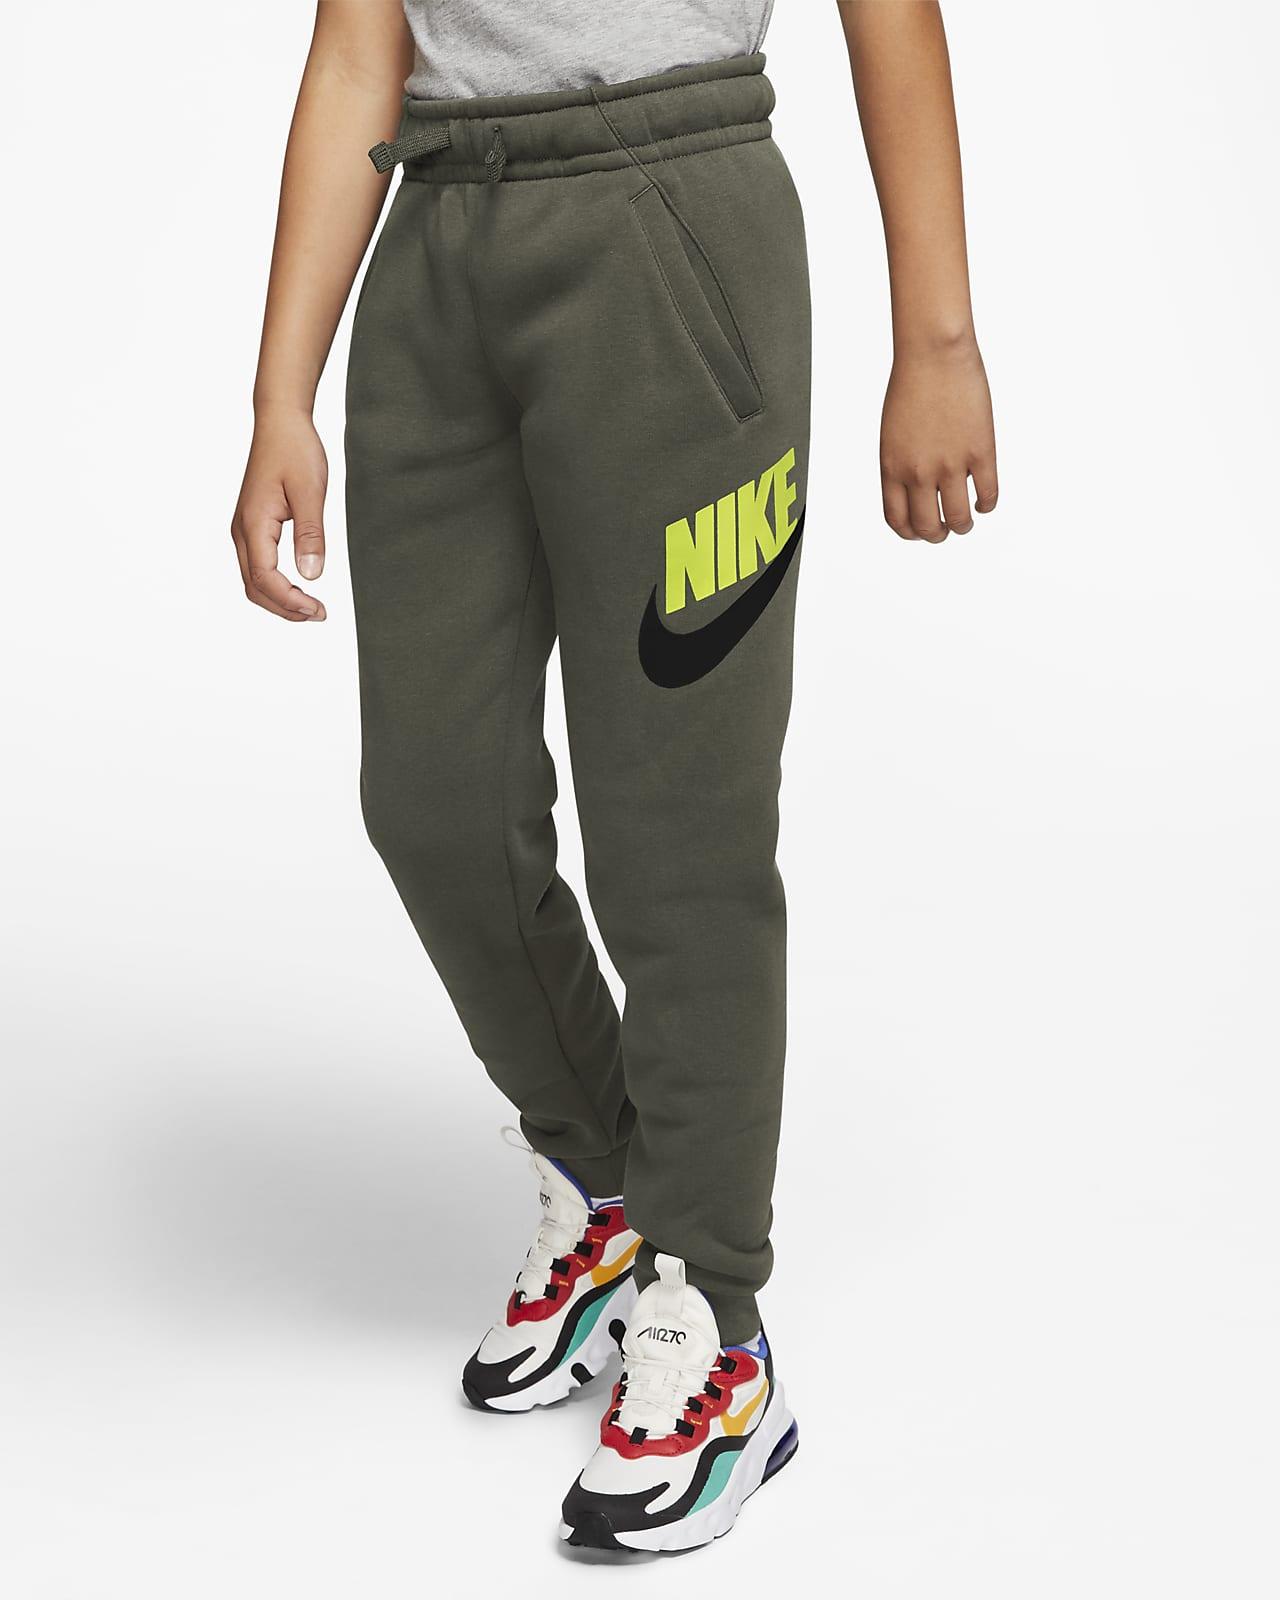 Брюки для мальчиков школьного возраста Nike Sportswear Club Fleece